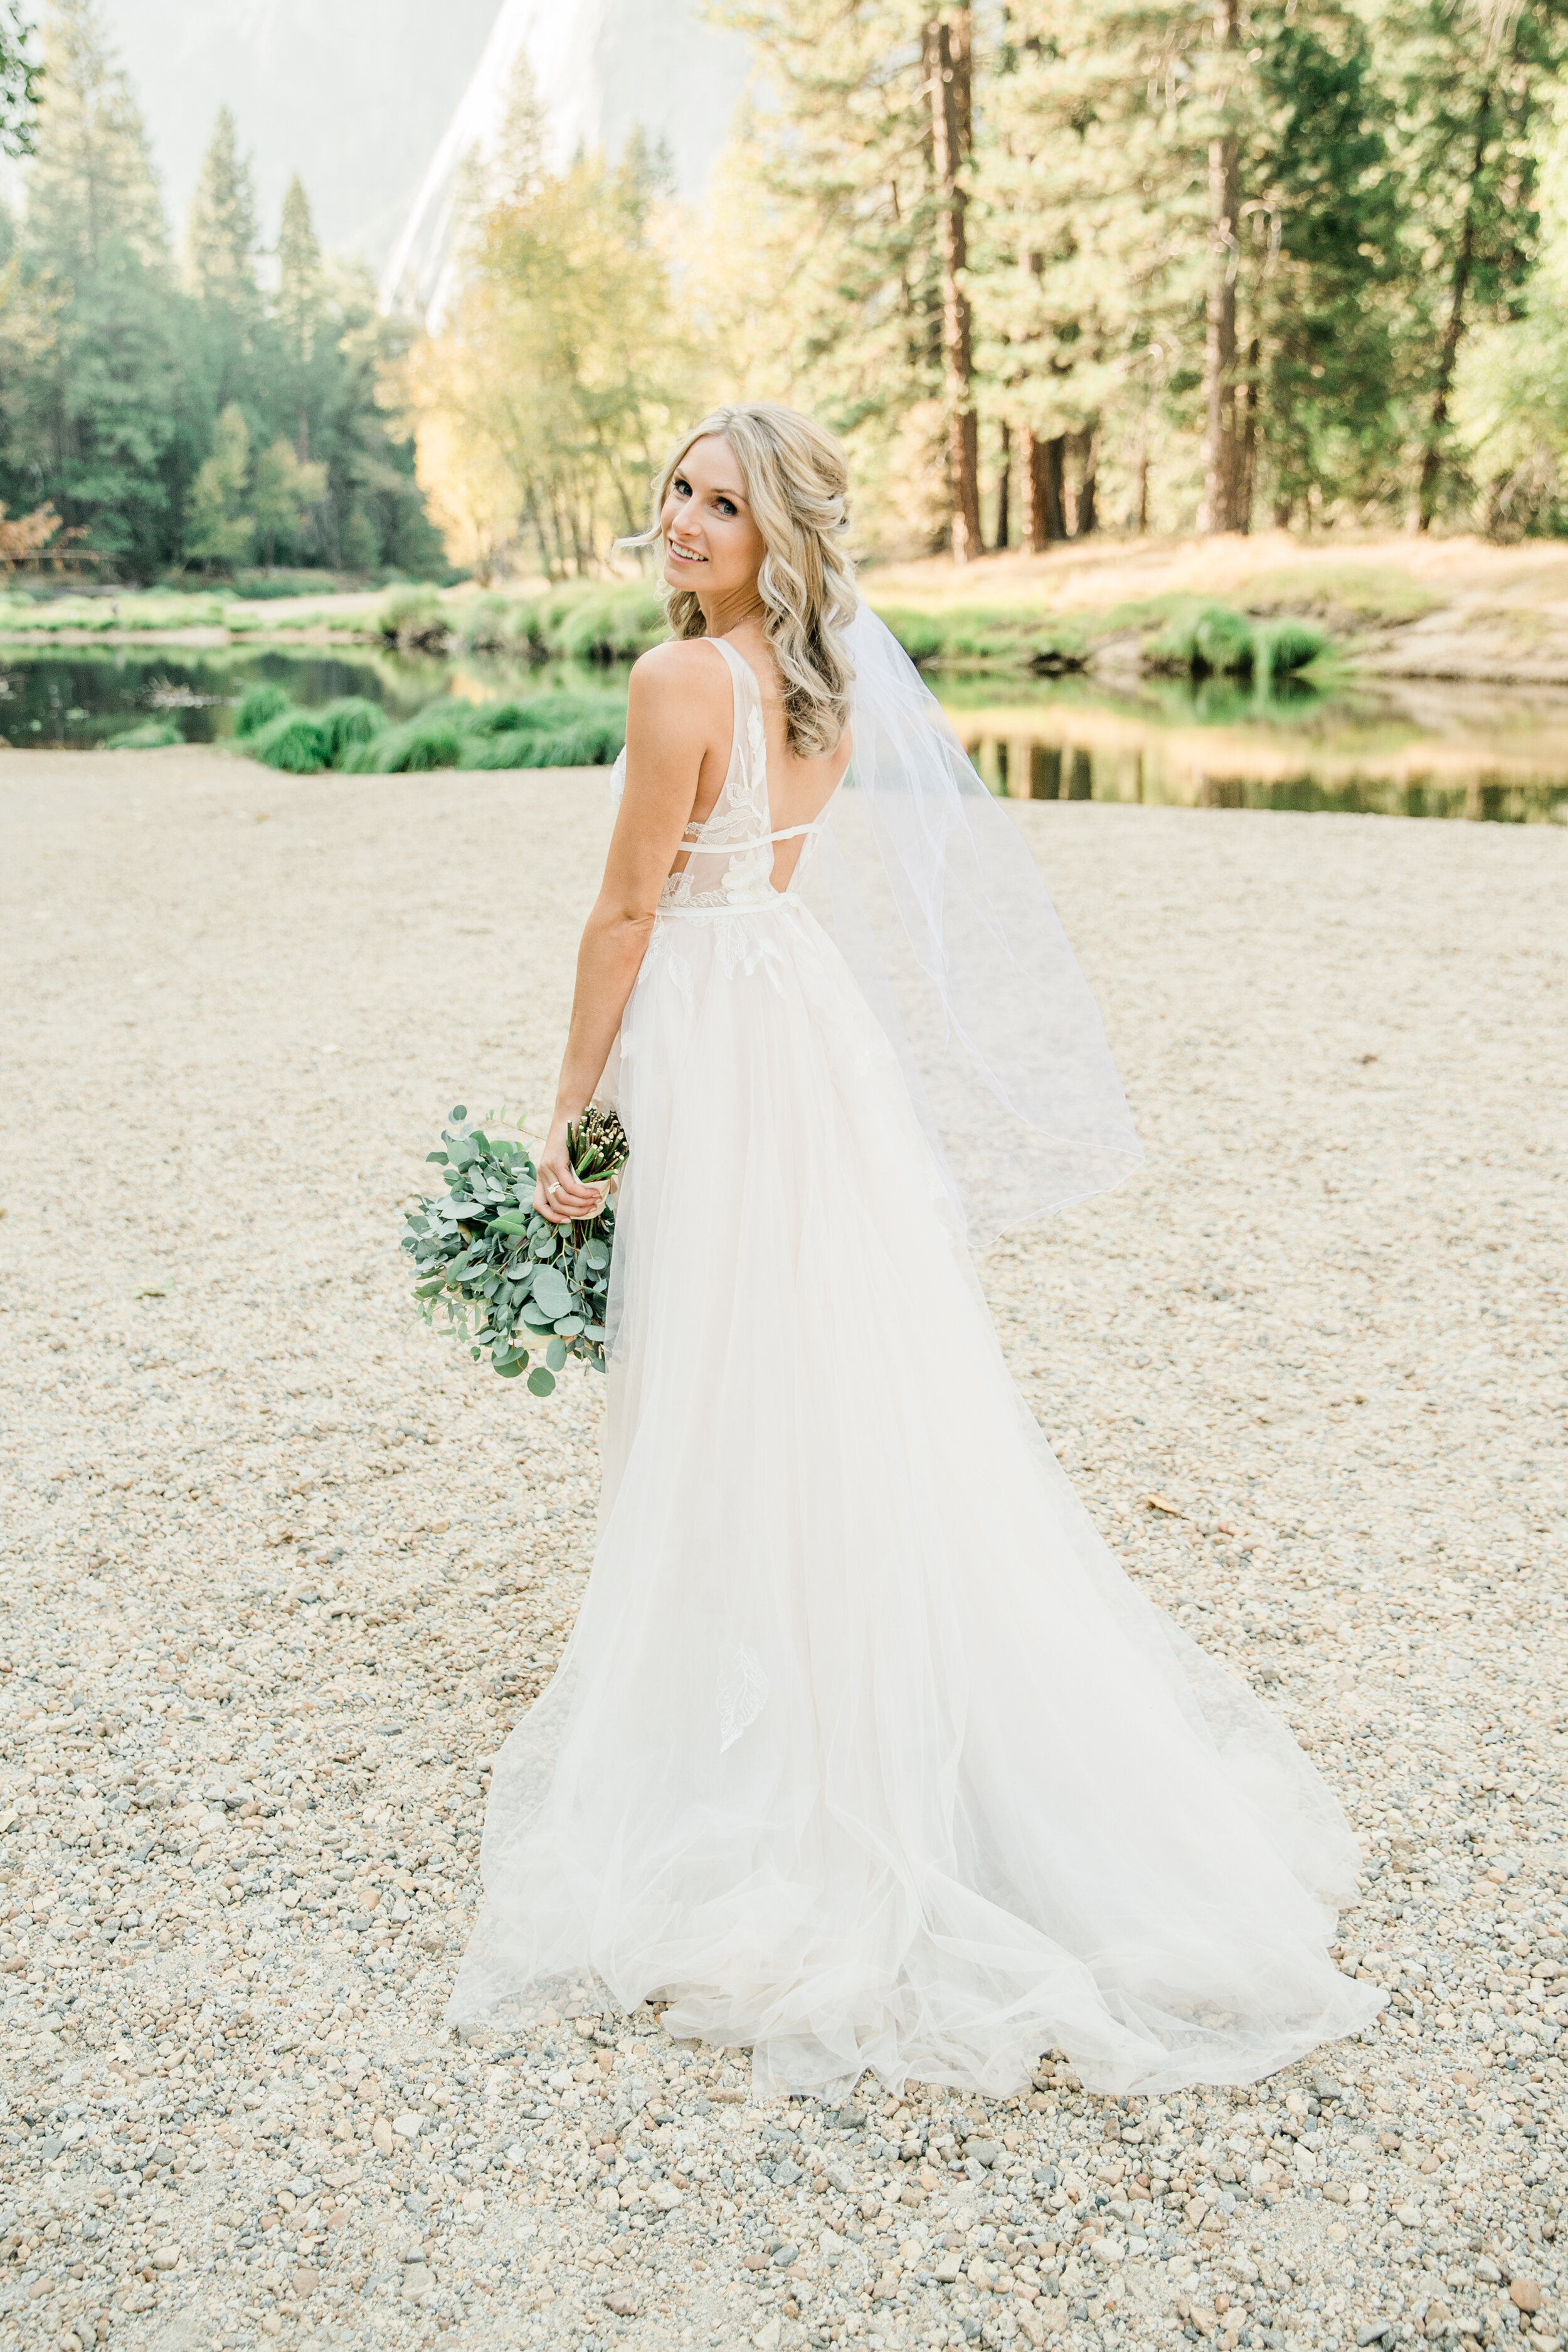 Leanne and Joe - Married - Sneak Peeks - Lauren Alisse Photography-32.jpg